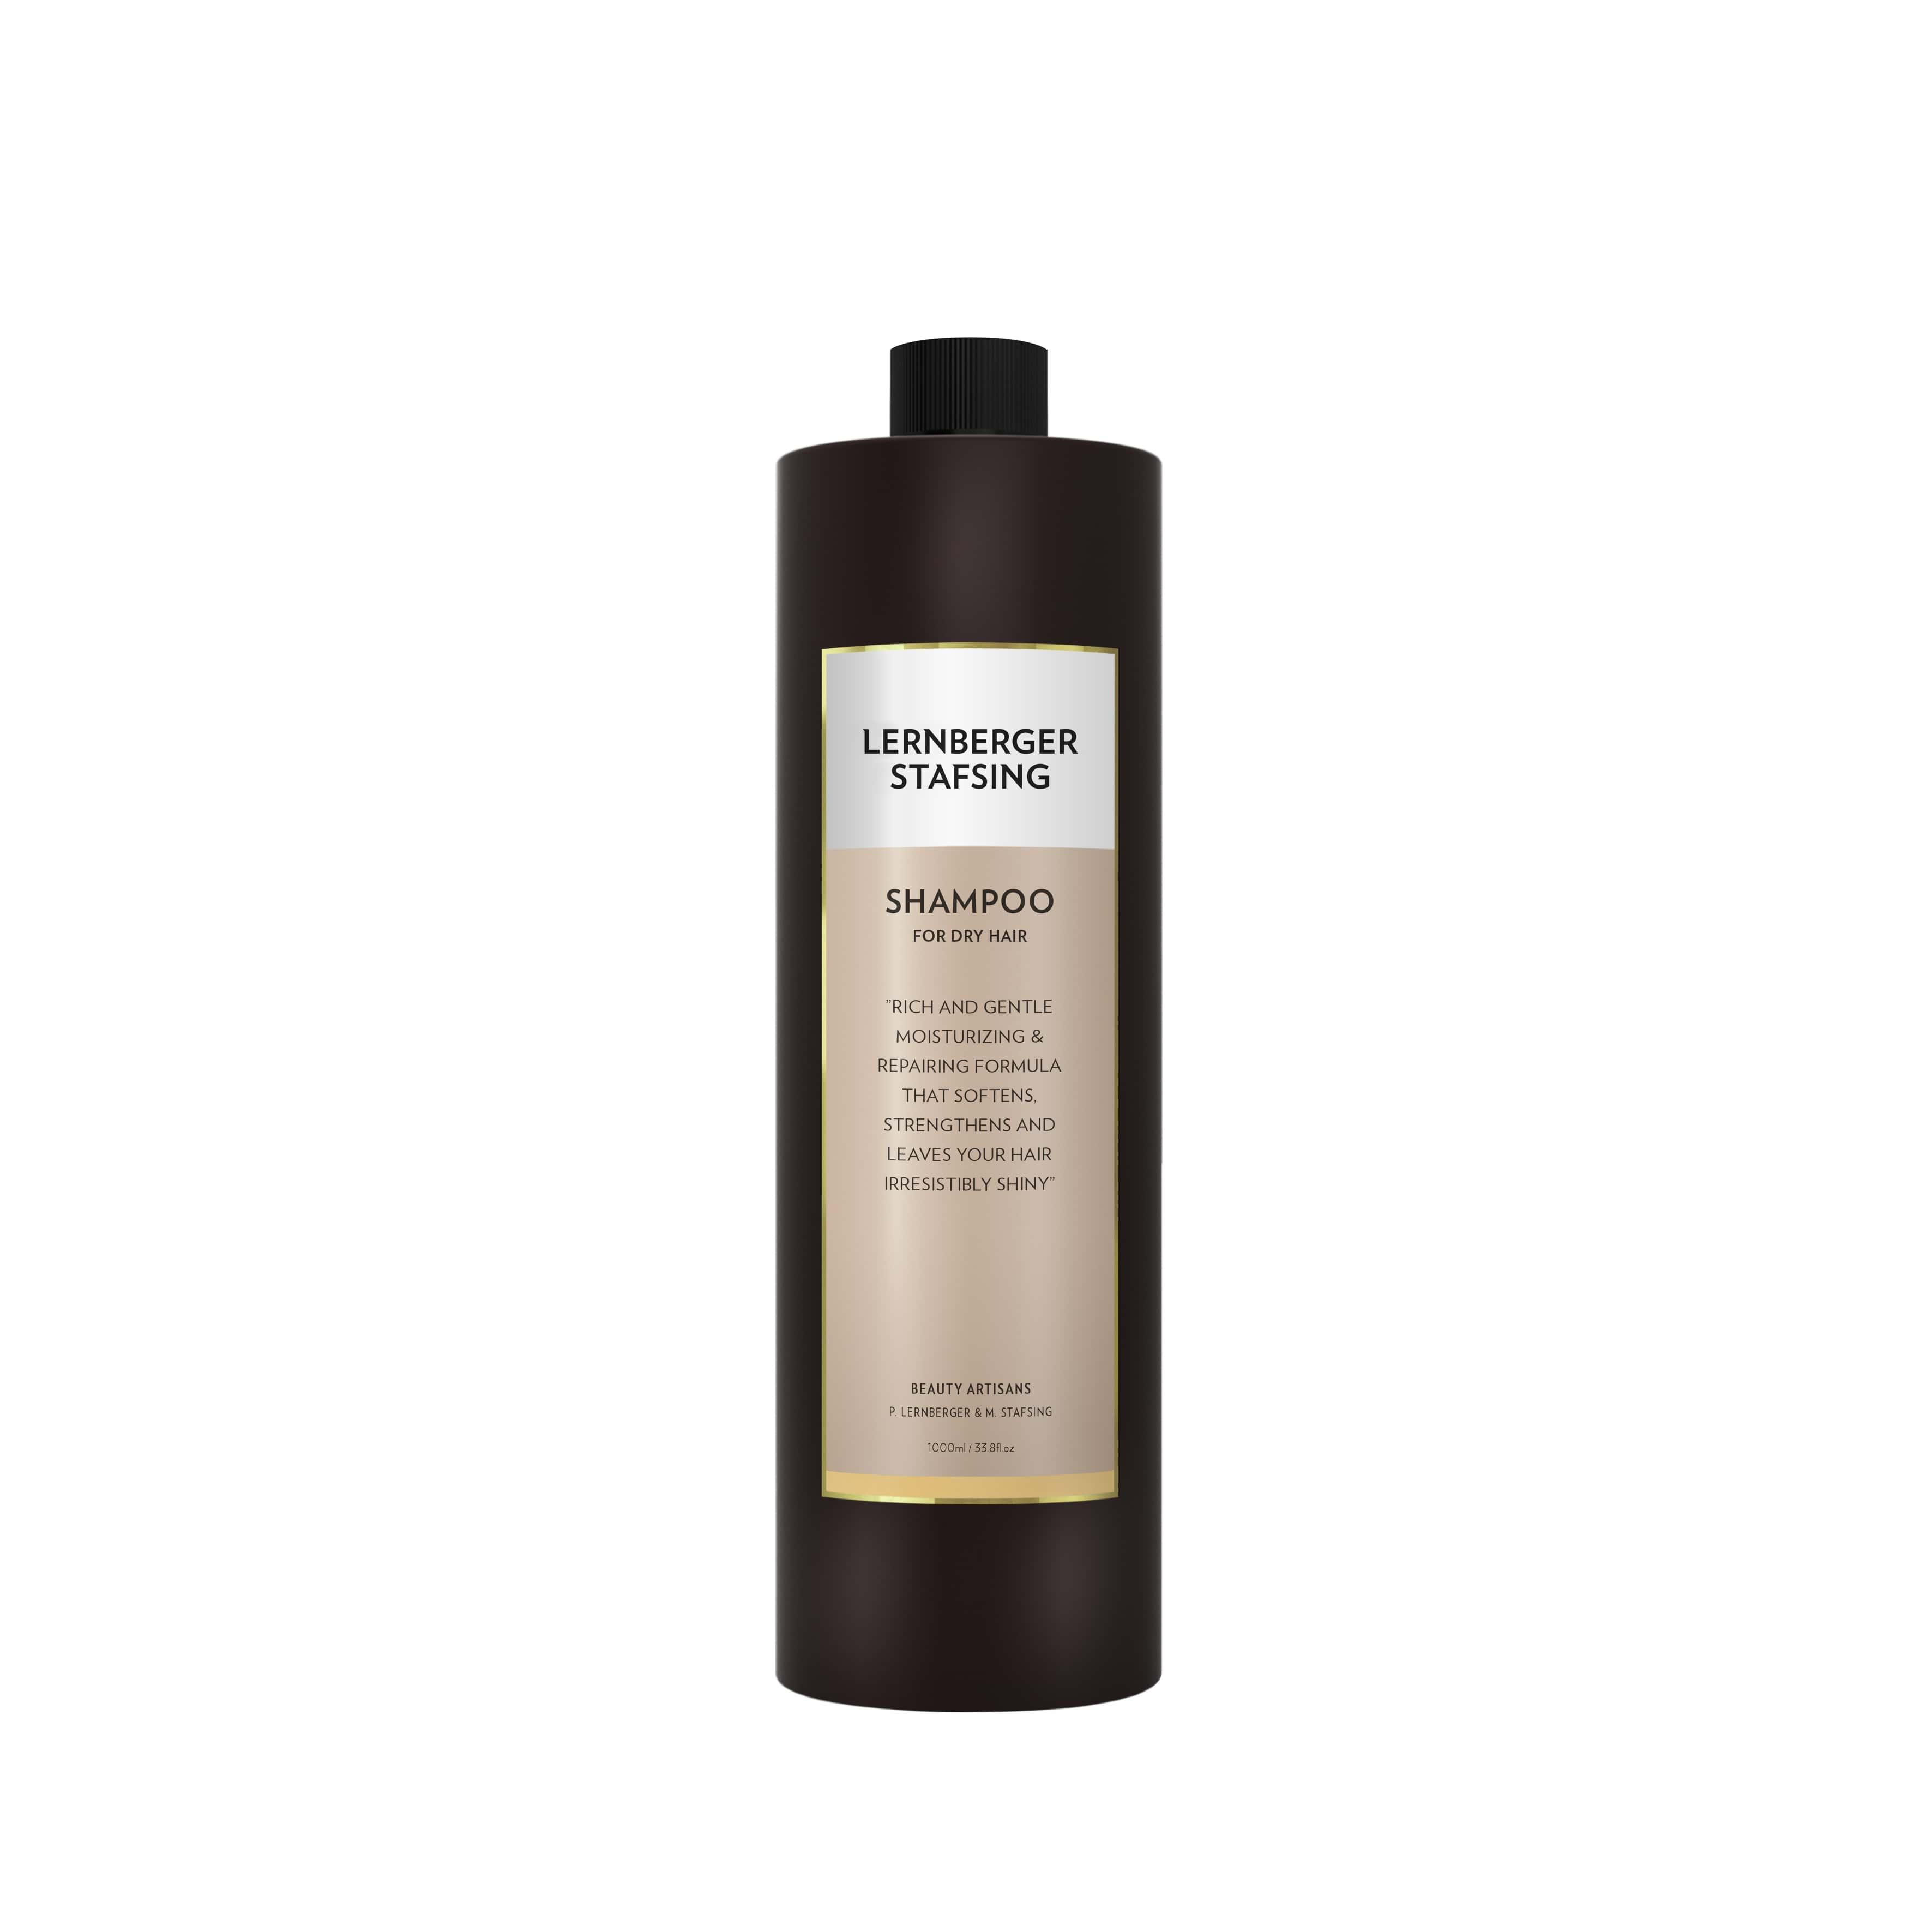 Lernberger Stafsing For Dry Hair Shampoo, 1000 ml